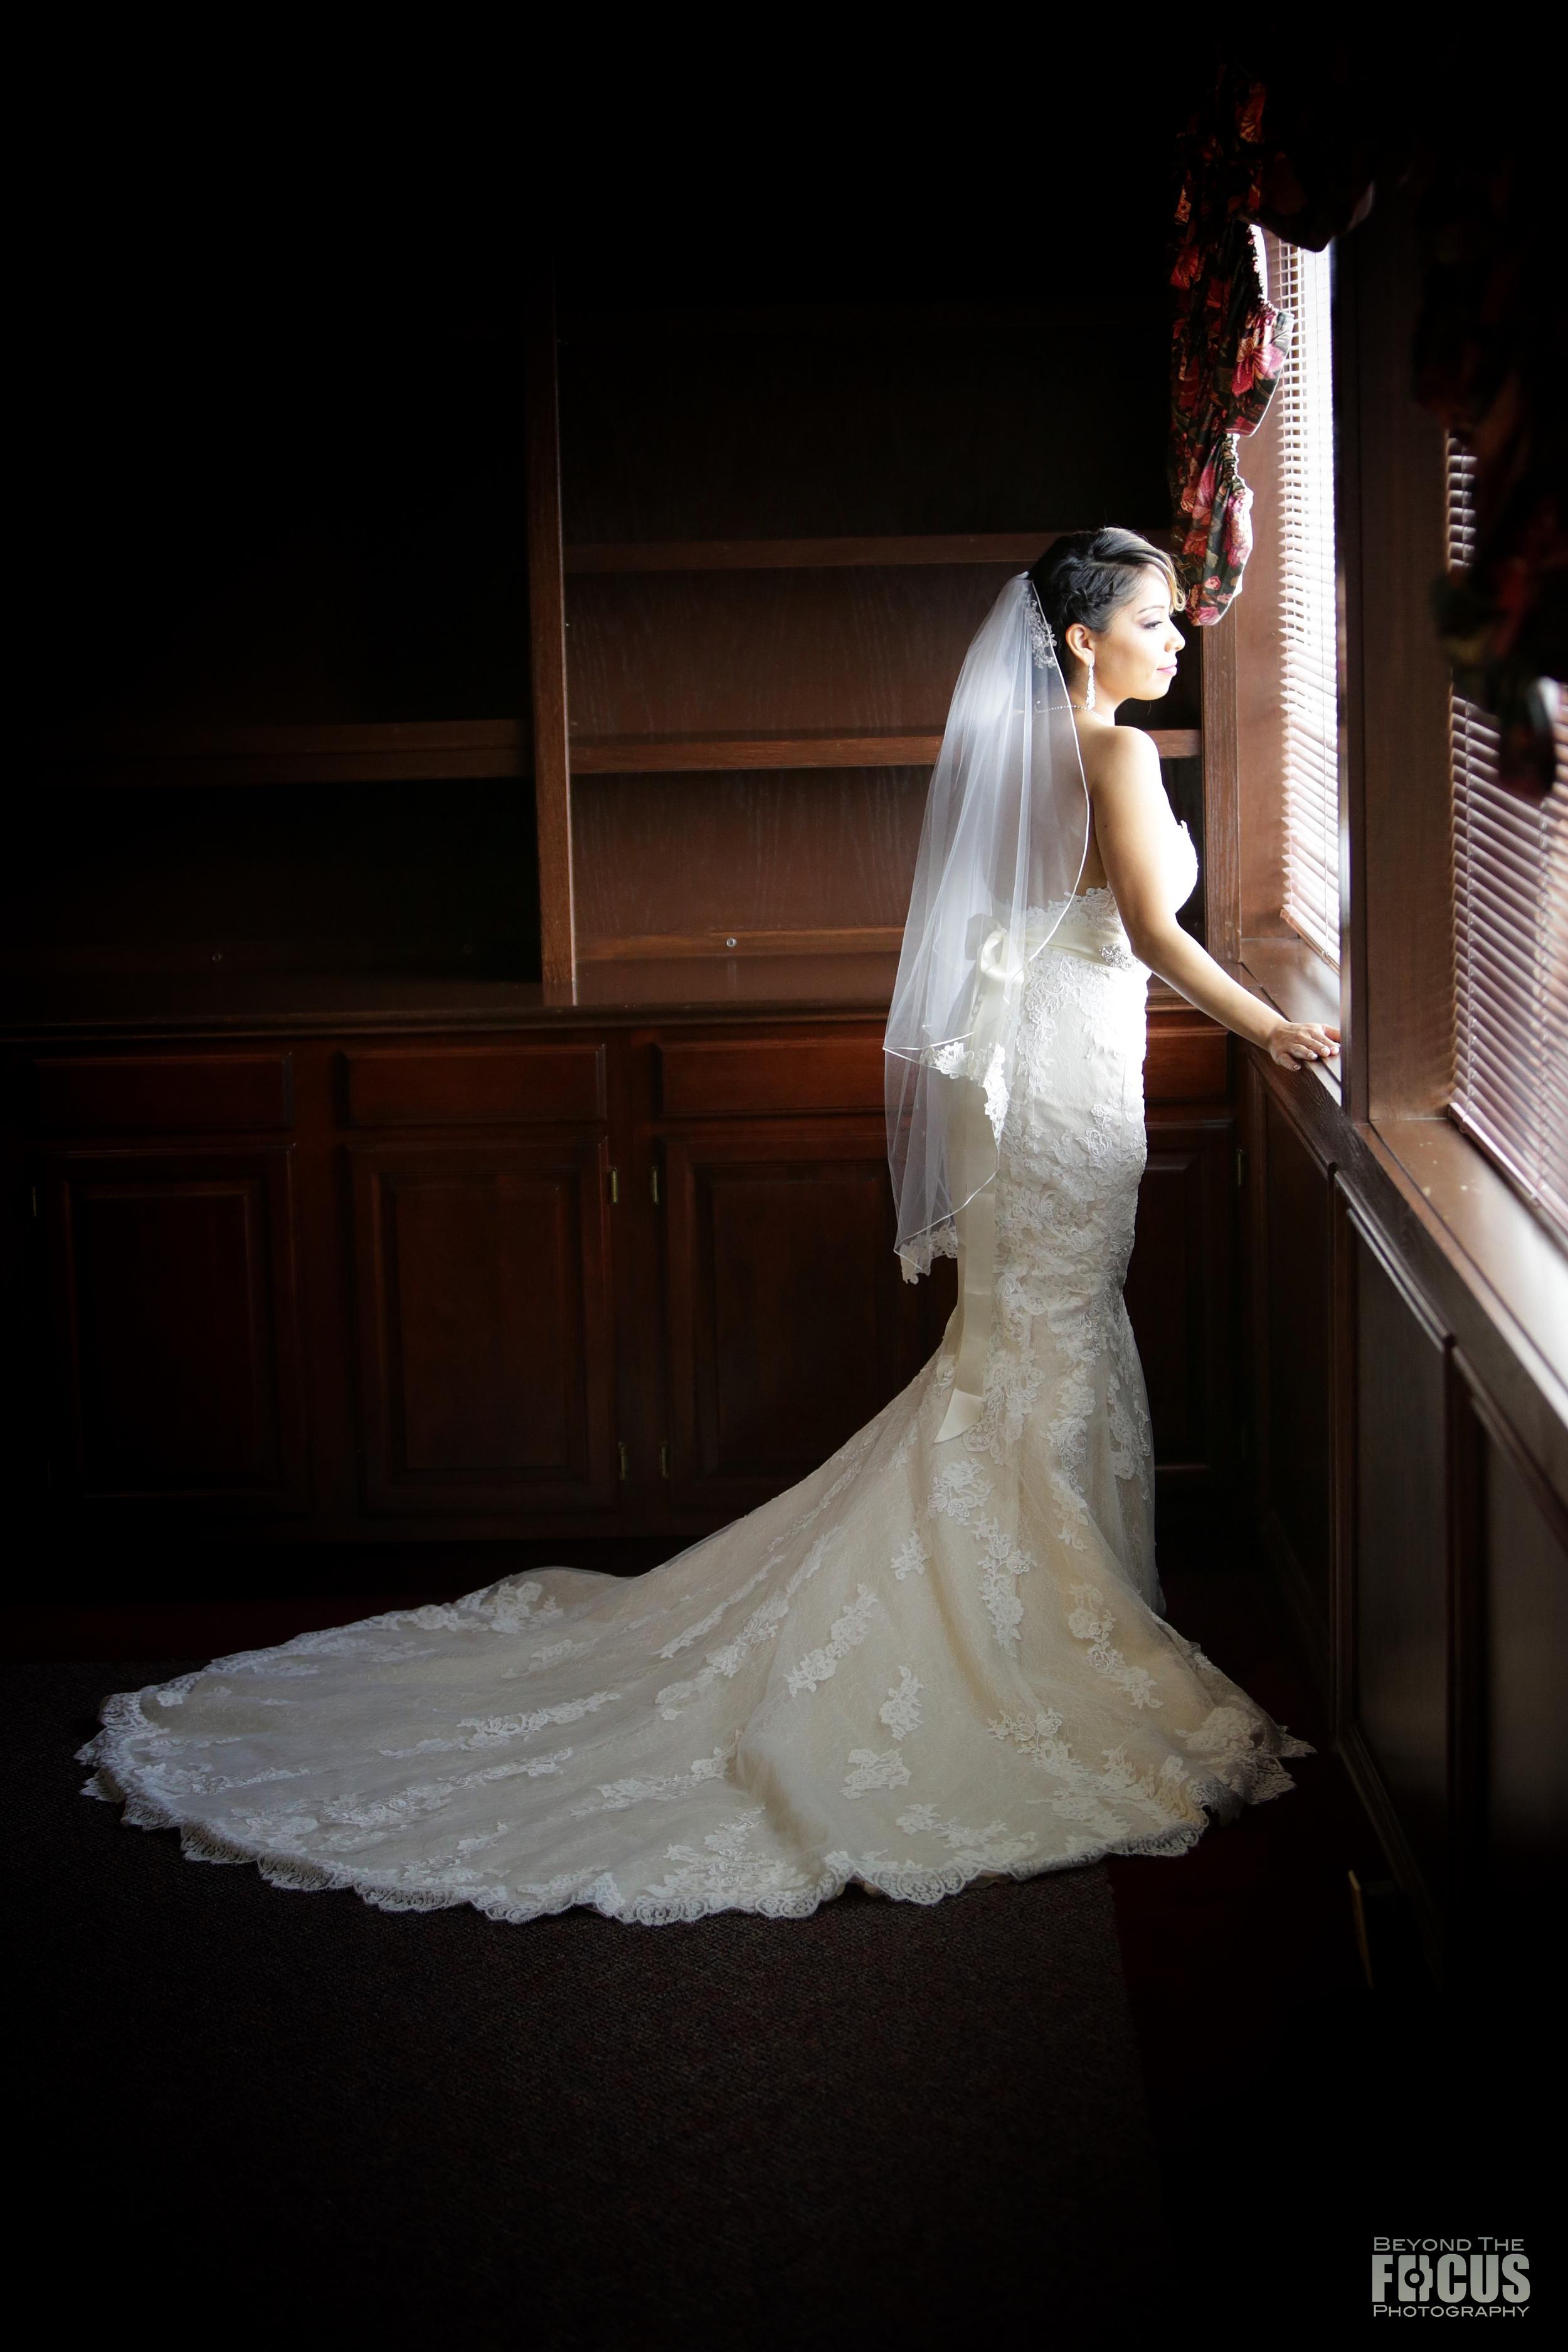 Palmer Wedding - Pre-Wedding Photos 3.jpg